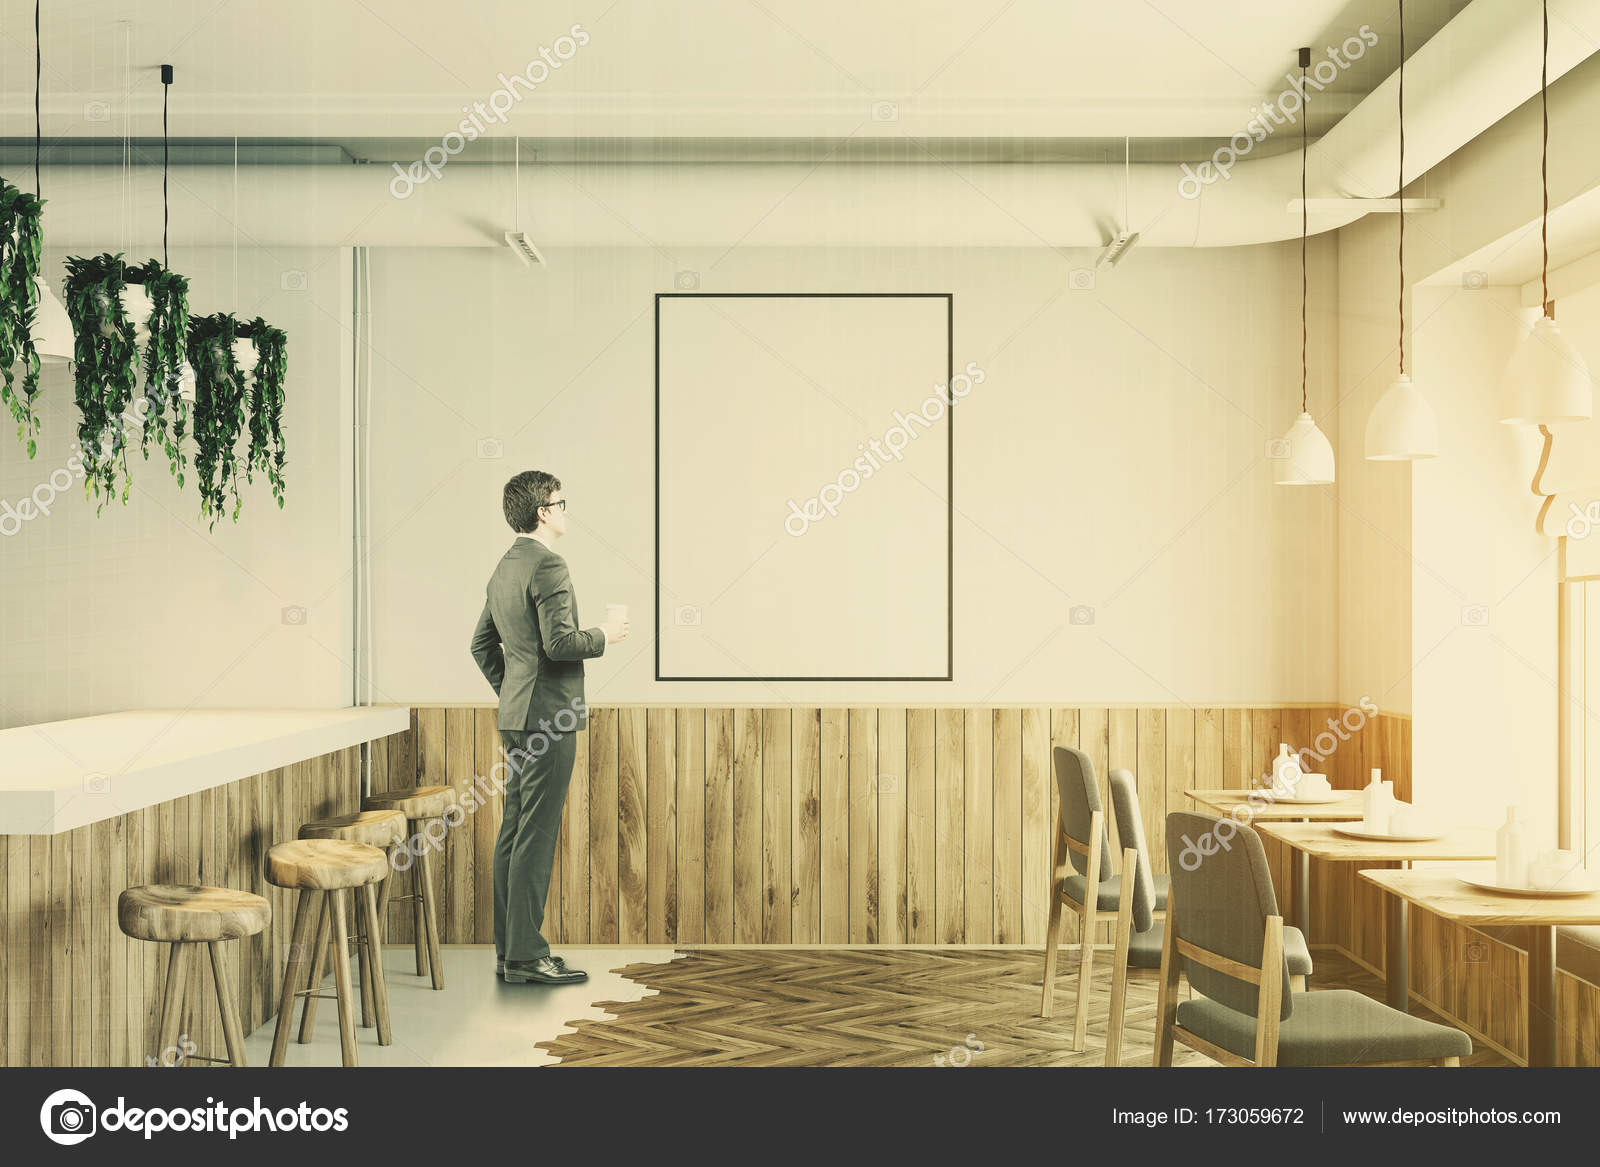 Bianco bar stand in legno poster tonica u foto stock